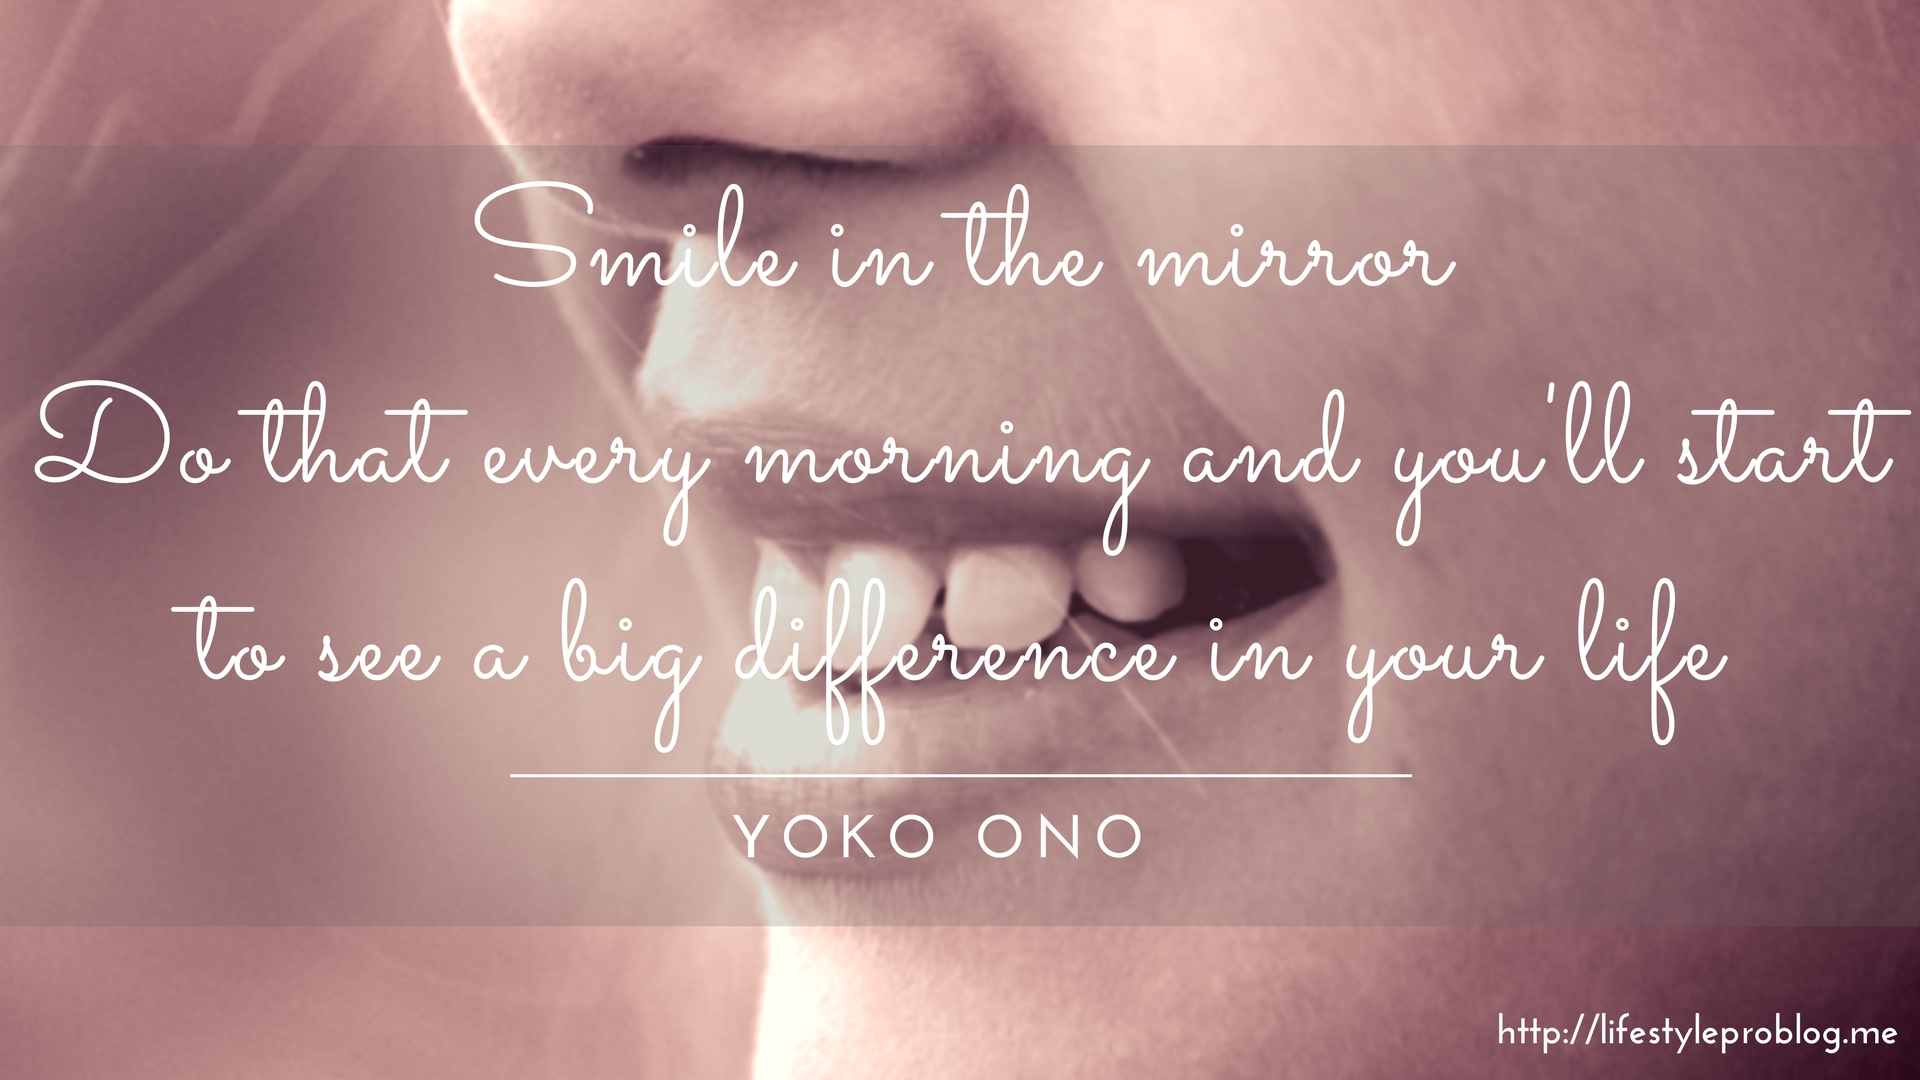 #AtoZChallenge : Yoko Ono Quote